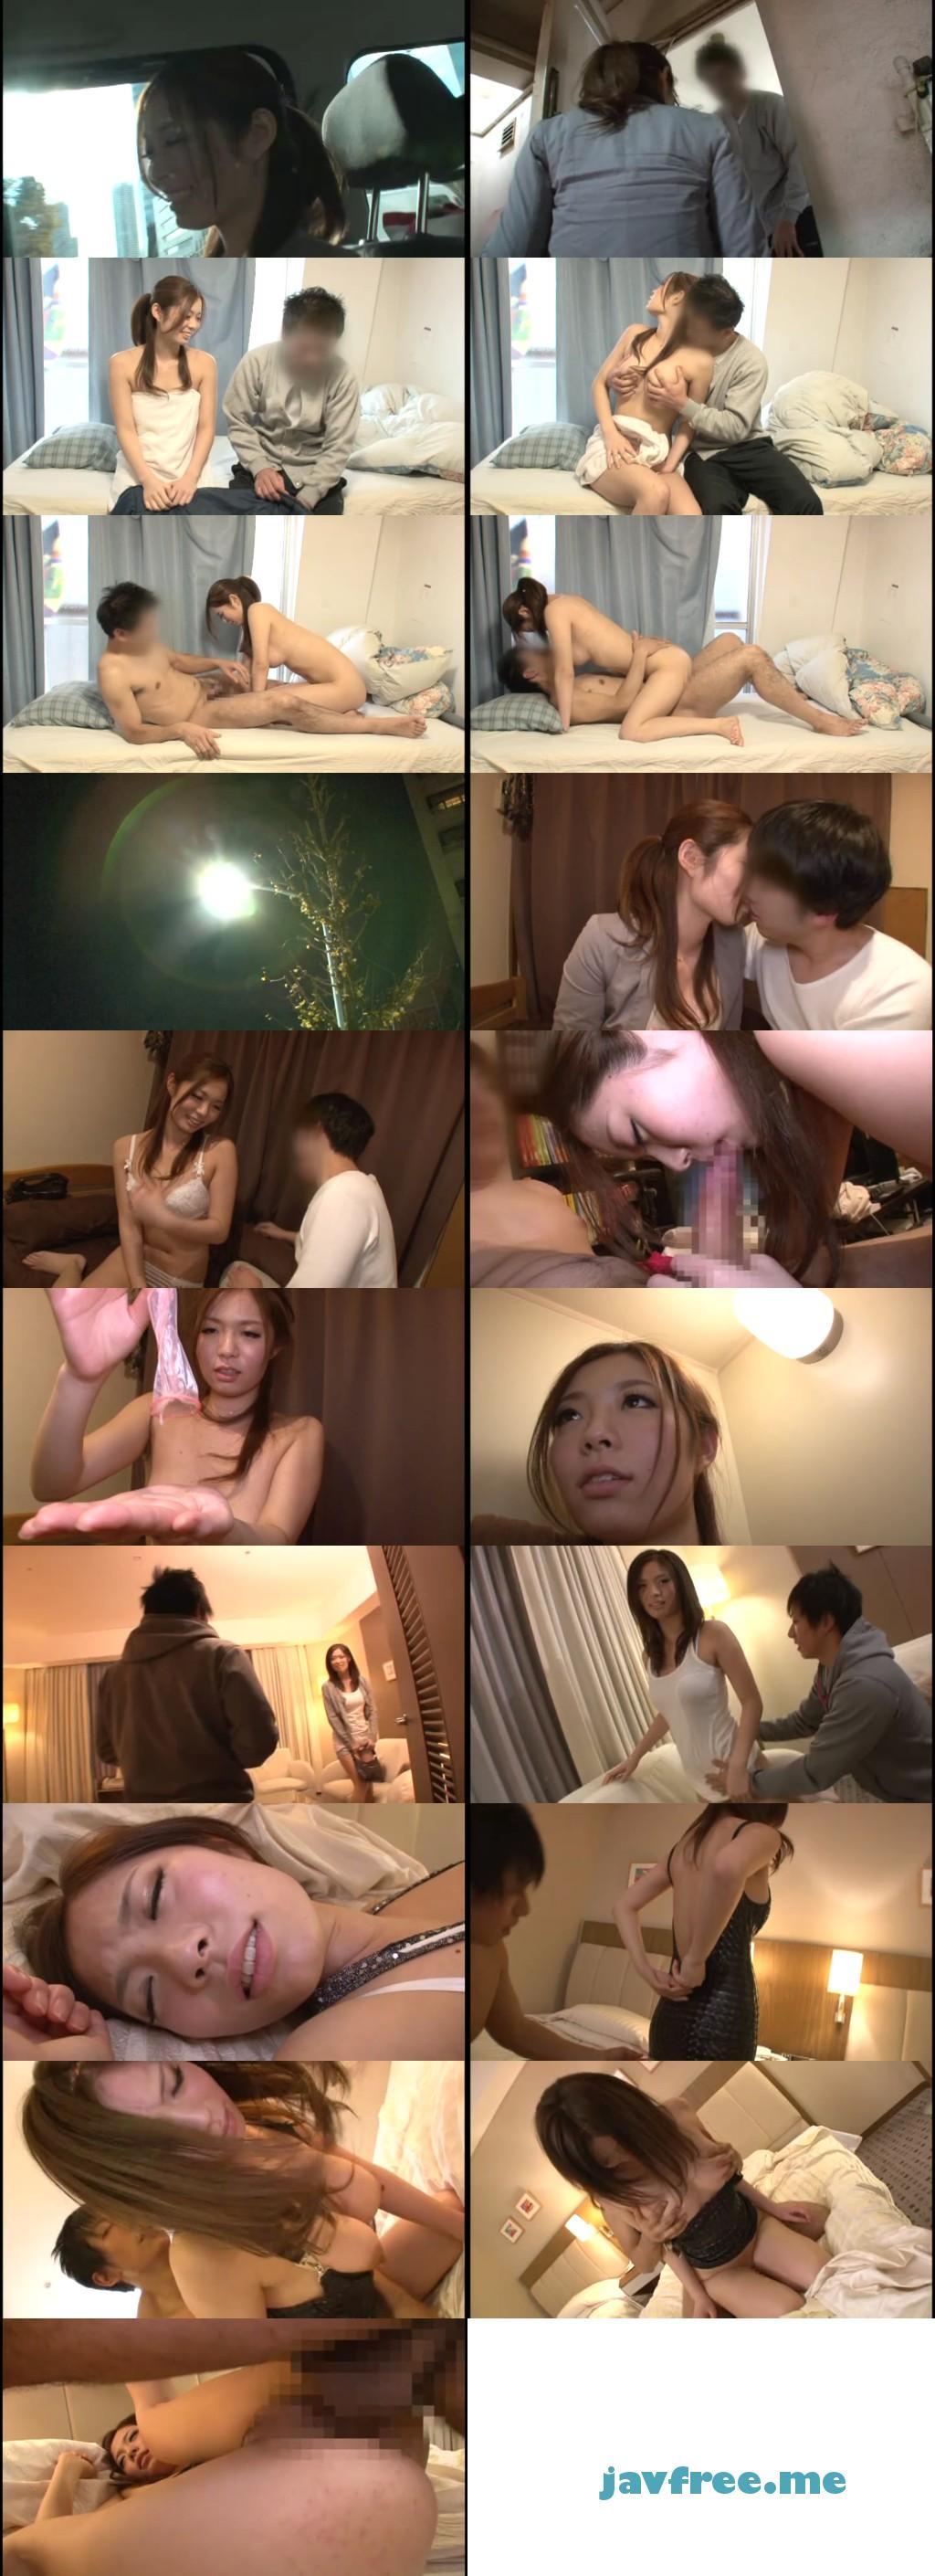 [HD][MAS 069] 続・素人娘、お貸しします。VOL.44 続・素人娘、お貸しします。 白石夏美 MAS